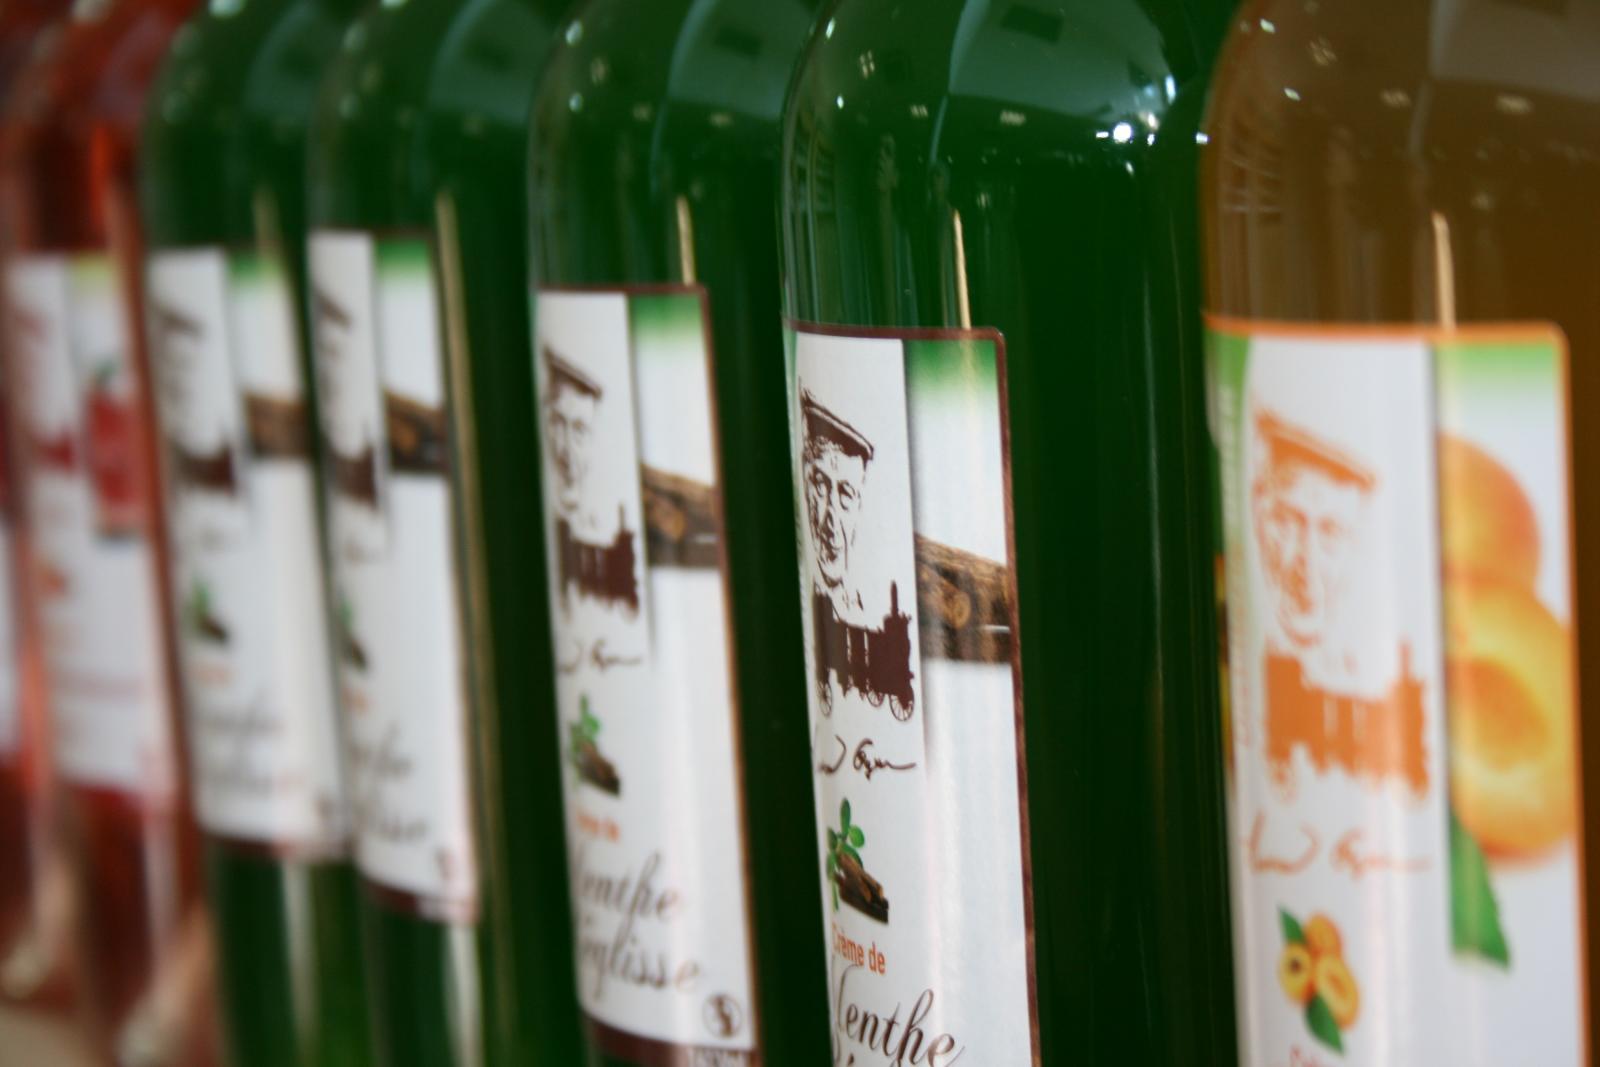 Ogier-bouteilles.jpg